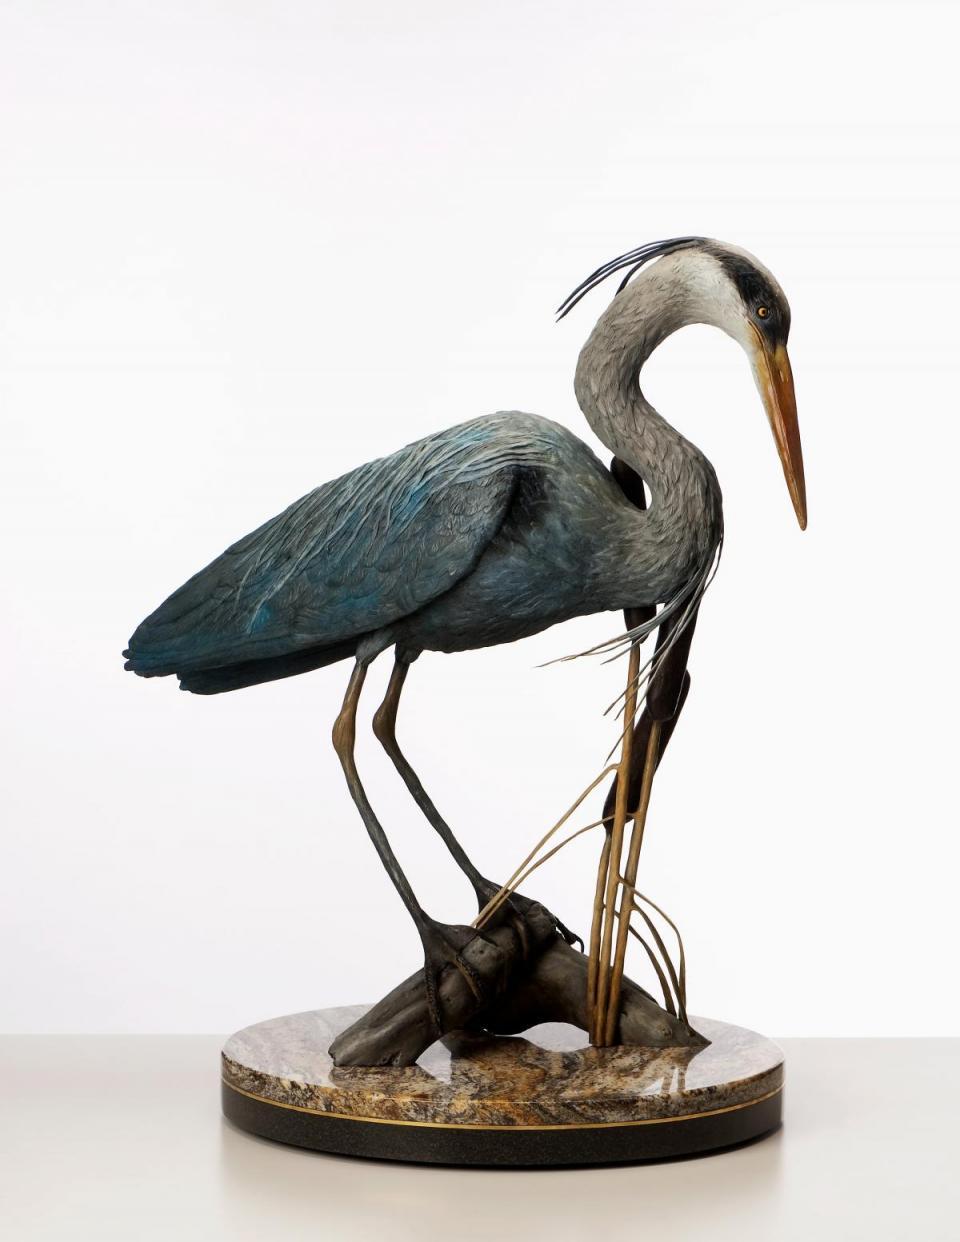 Add Artwork | Sculpture by Brent Cooke | Artists for Conservation